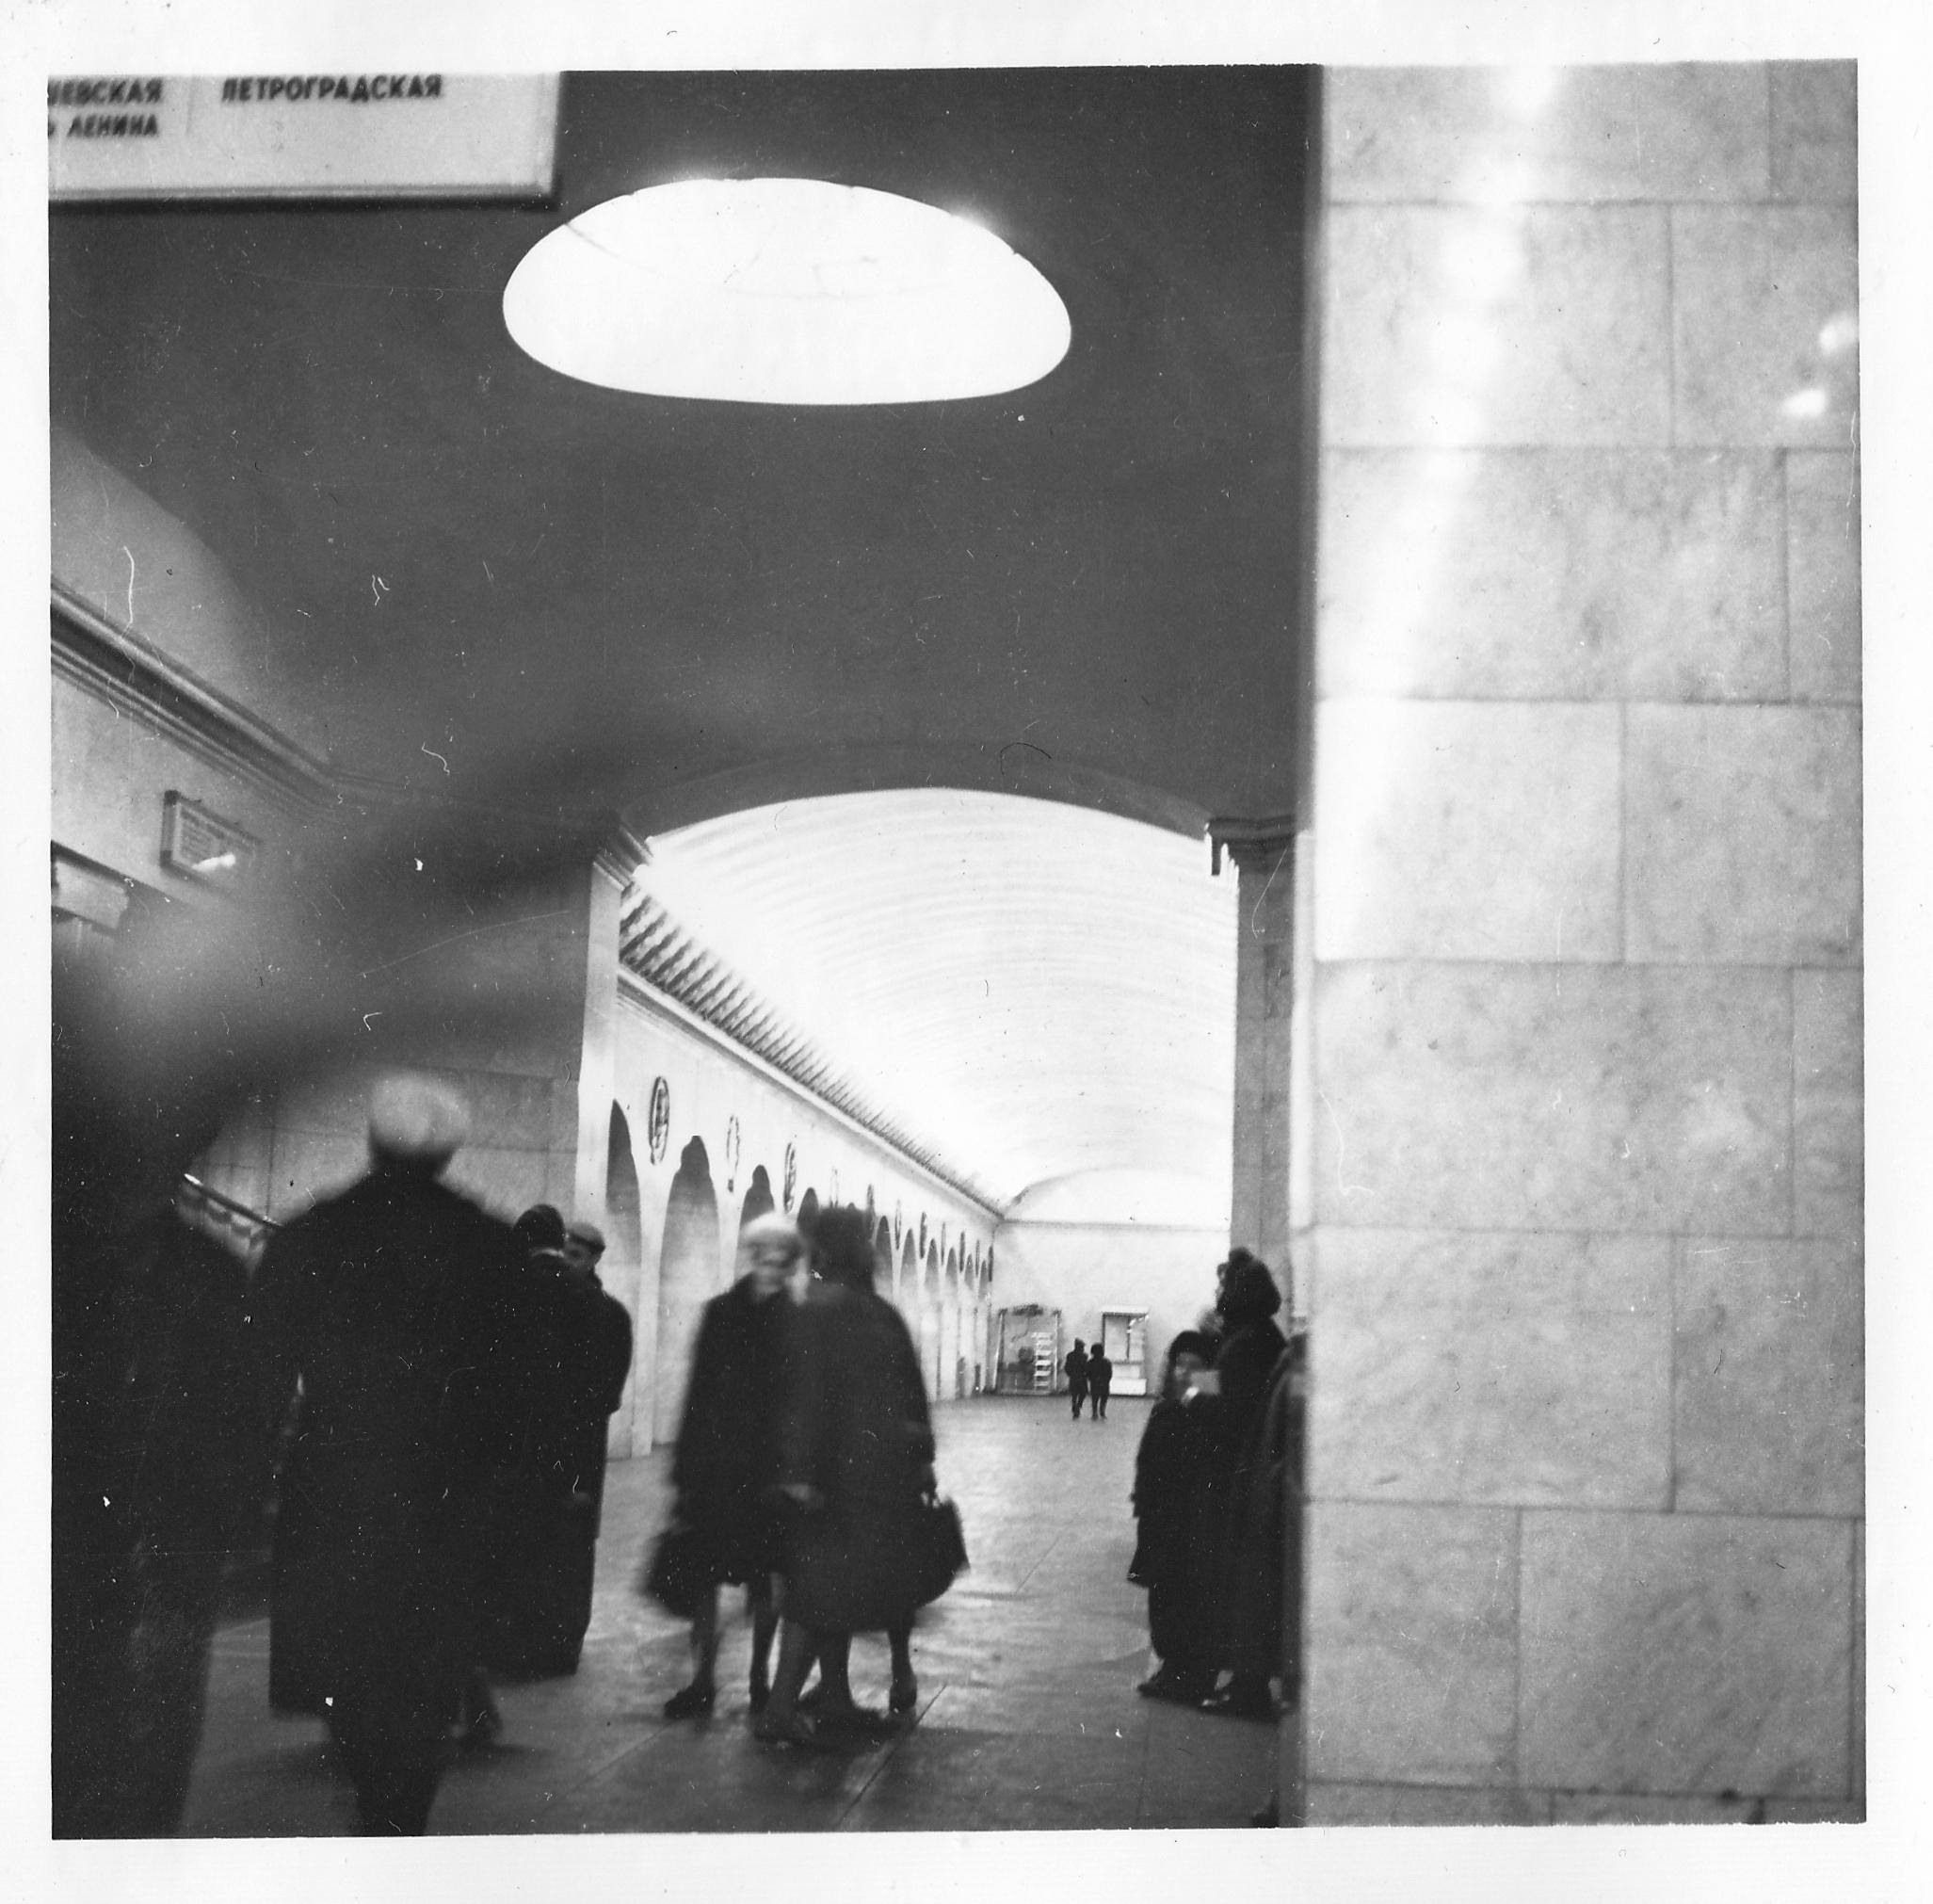 Ленинградское метро